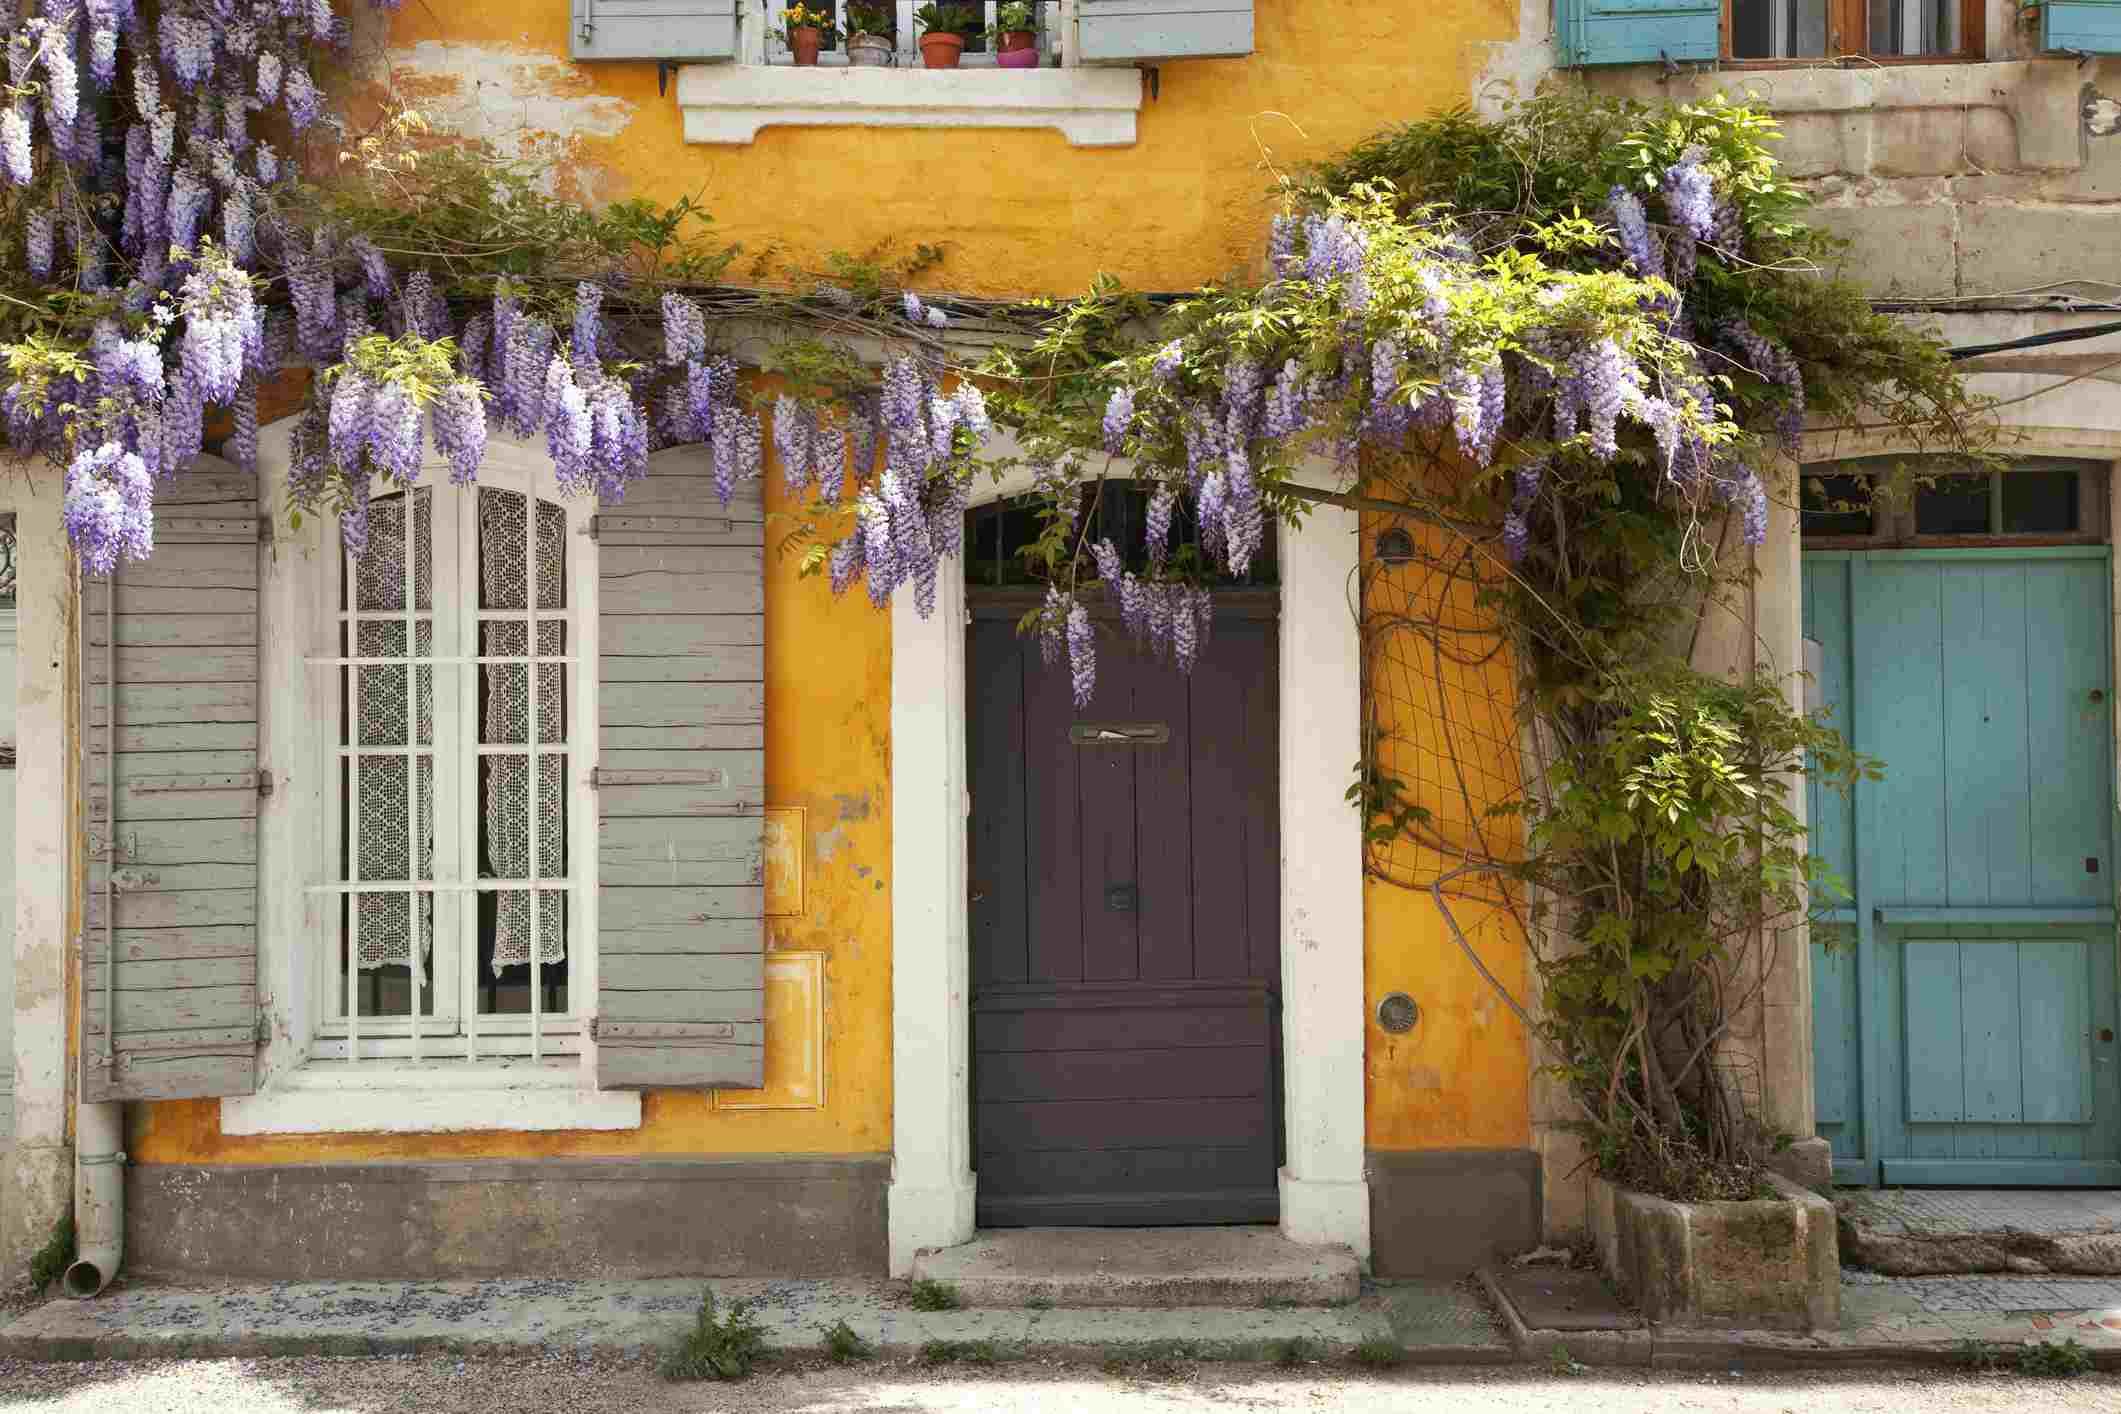 Francia, Bouches du Rhone, Arles, distrito de la Roquette, rue GENIVI